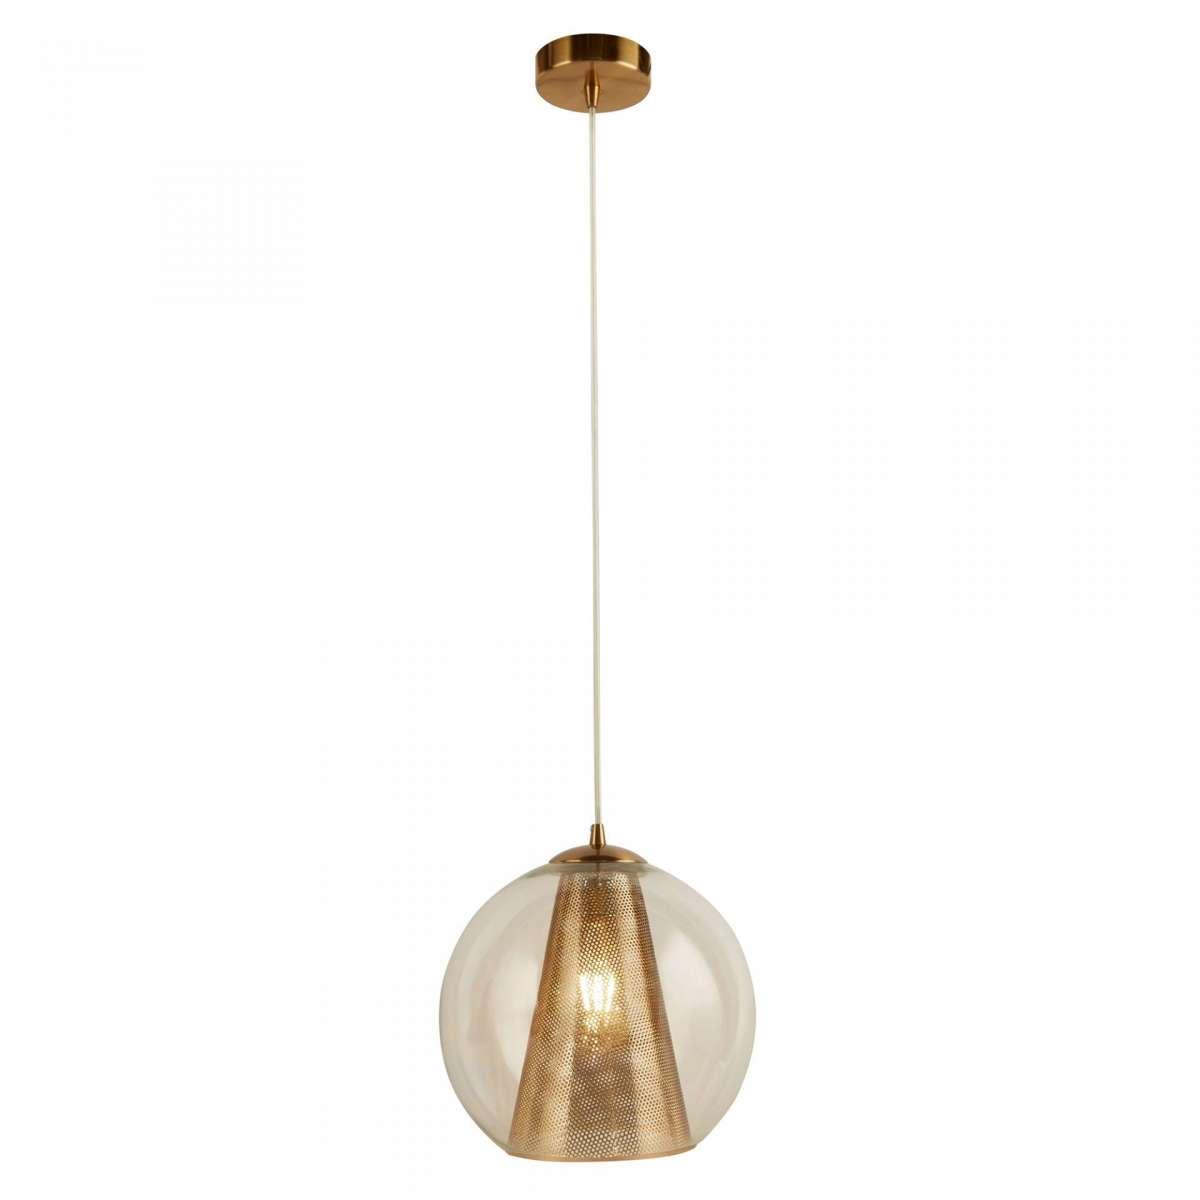 Conio Single Pendant Satin Brass And Clear Glass